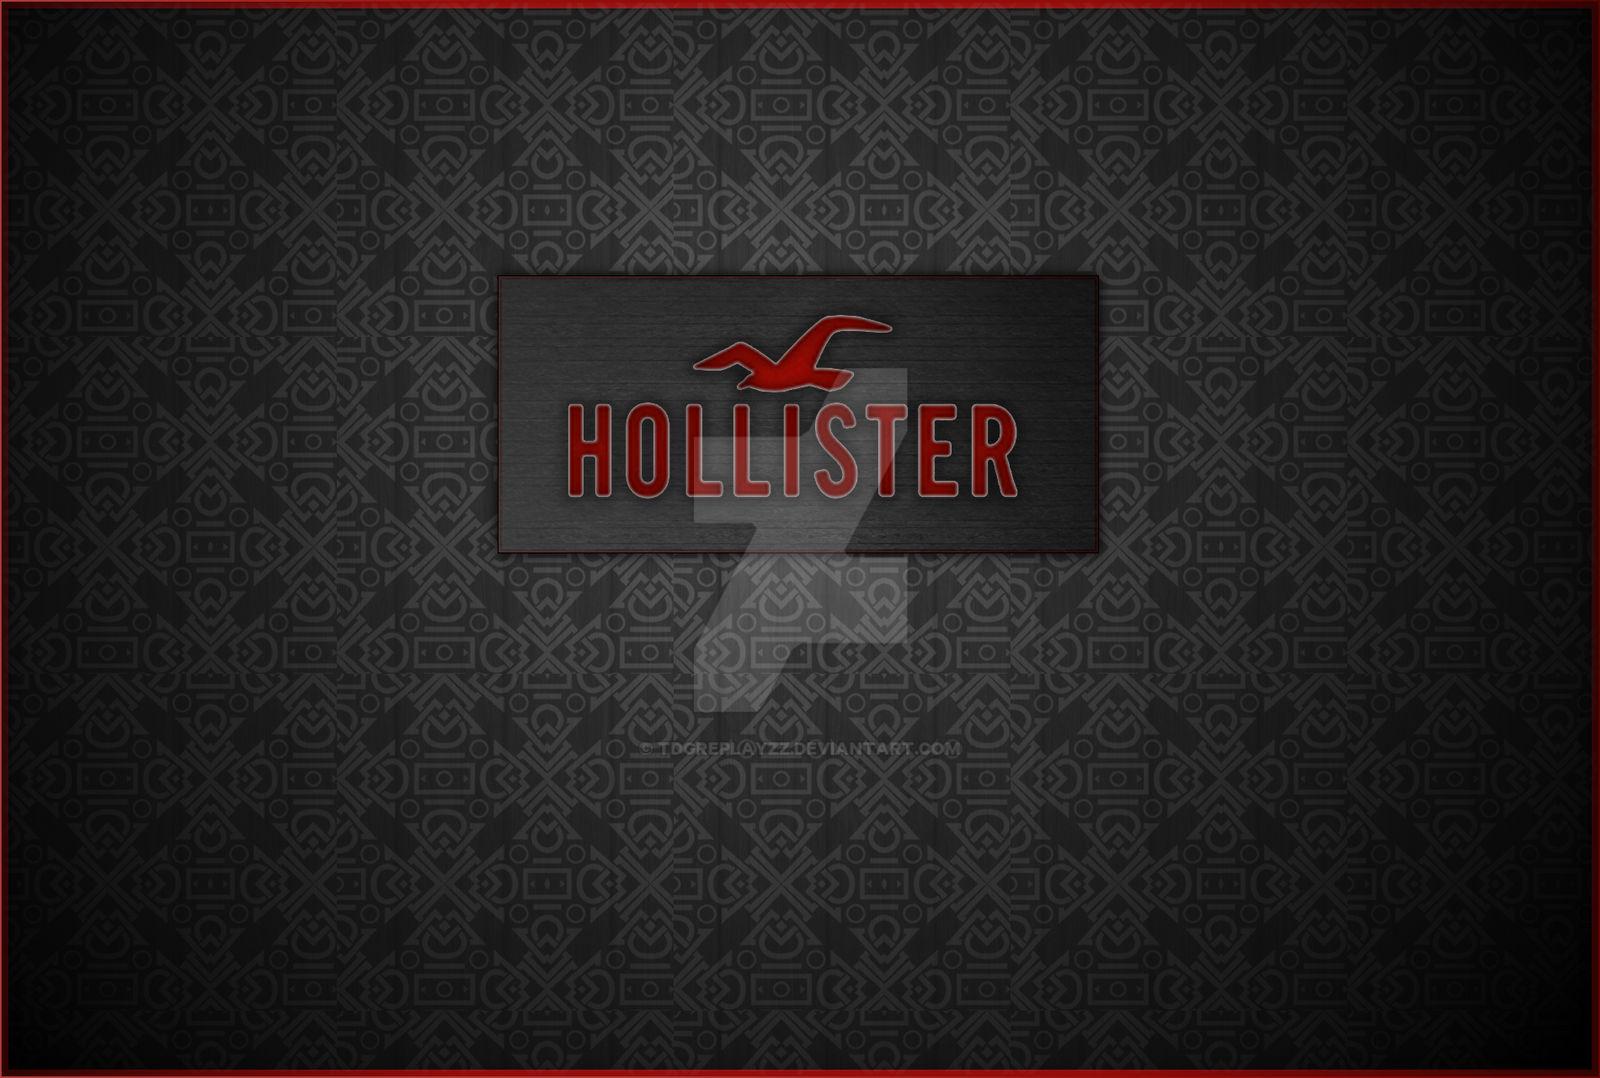 Hollister HD Wallpaper 2012 by